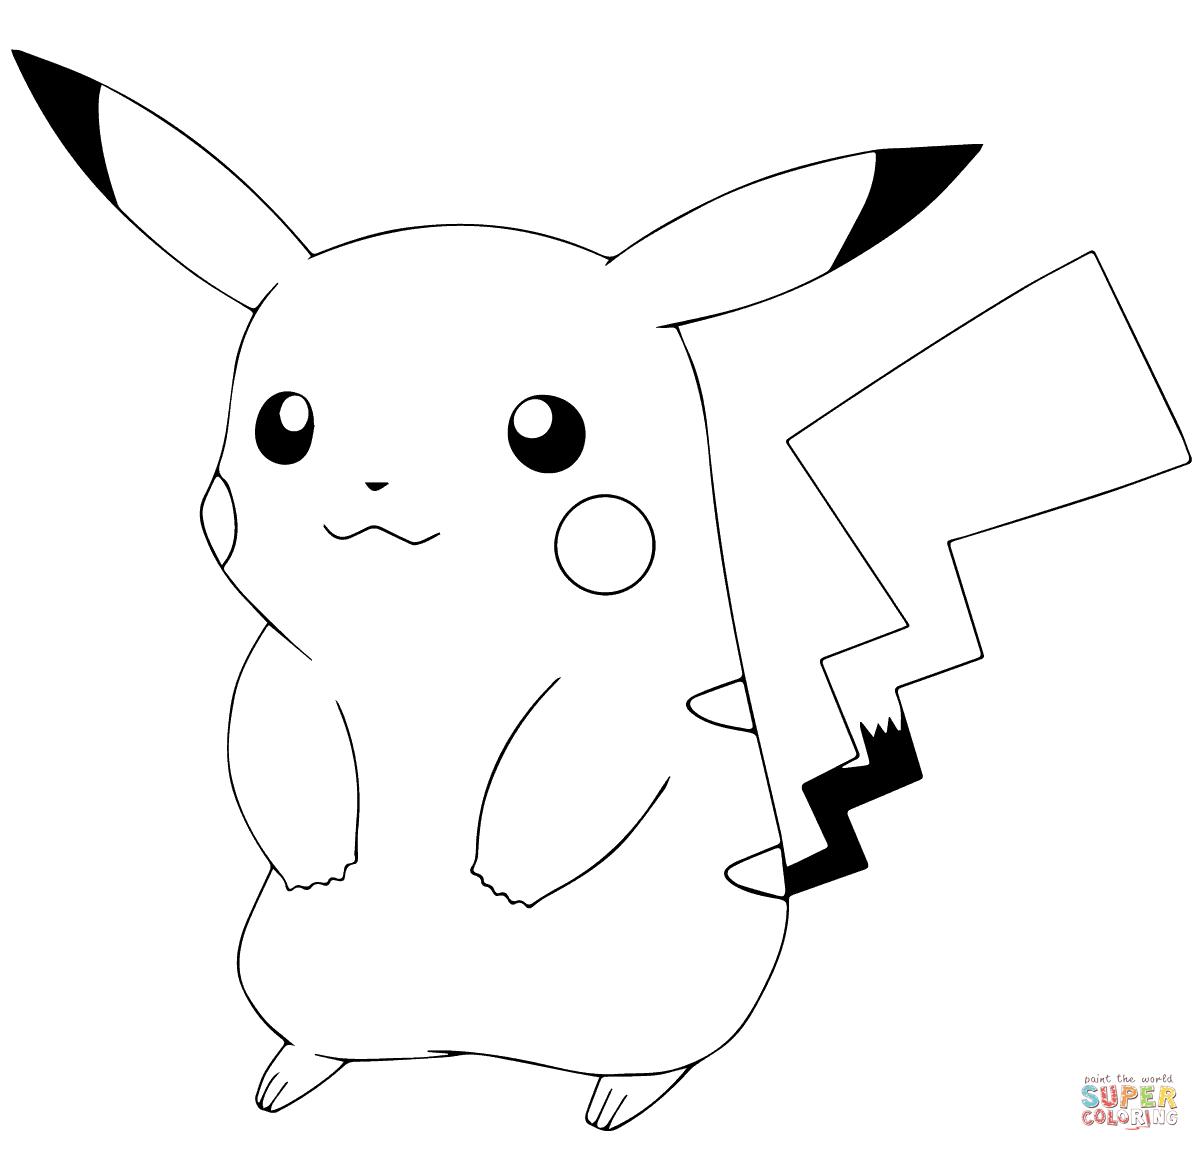 Pokémon Go Pikachu Coloring Page   Free Printable Coloring Pages - Free Printable Coloring Pages Pokemon Black White